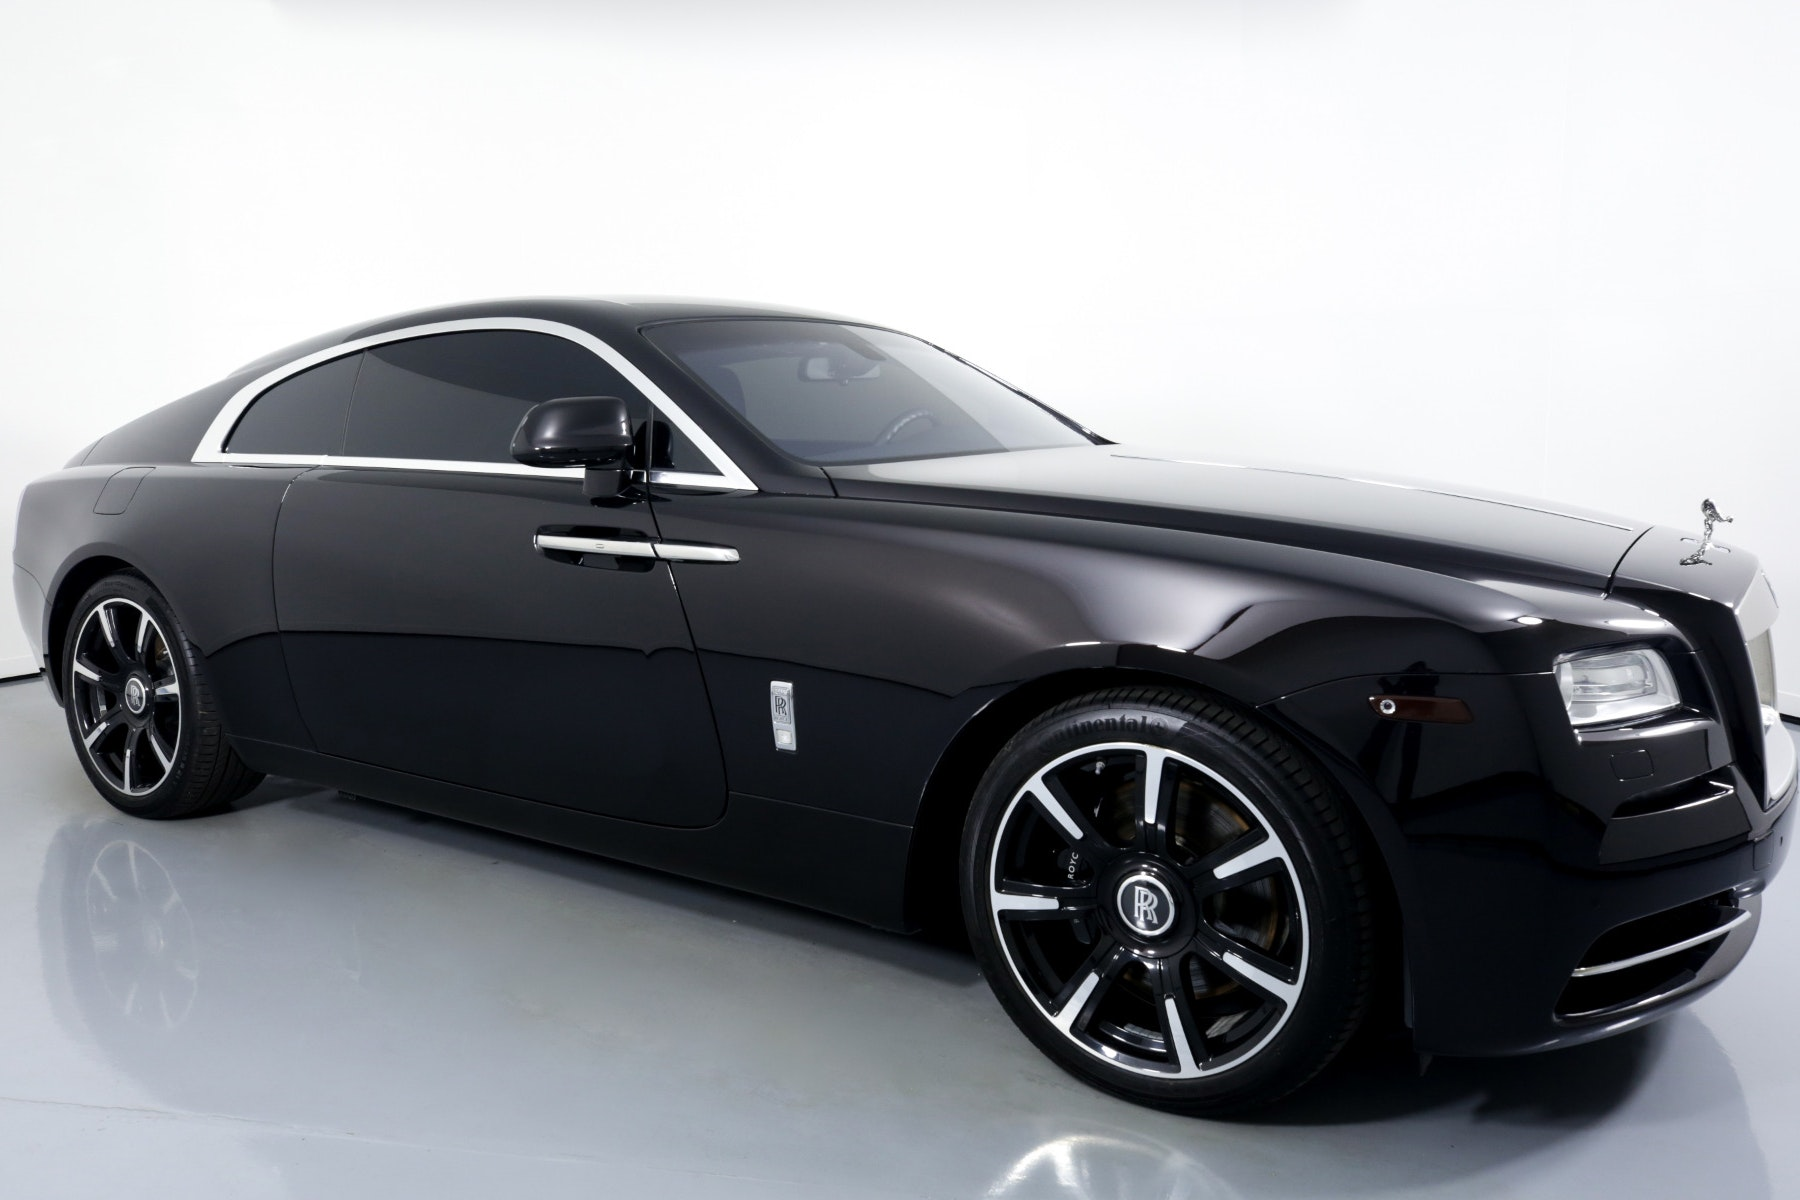 Miami Rolls Royce Wraith image #3